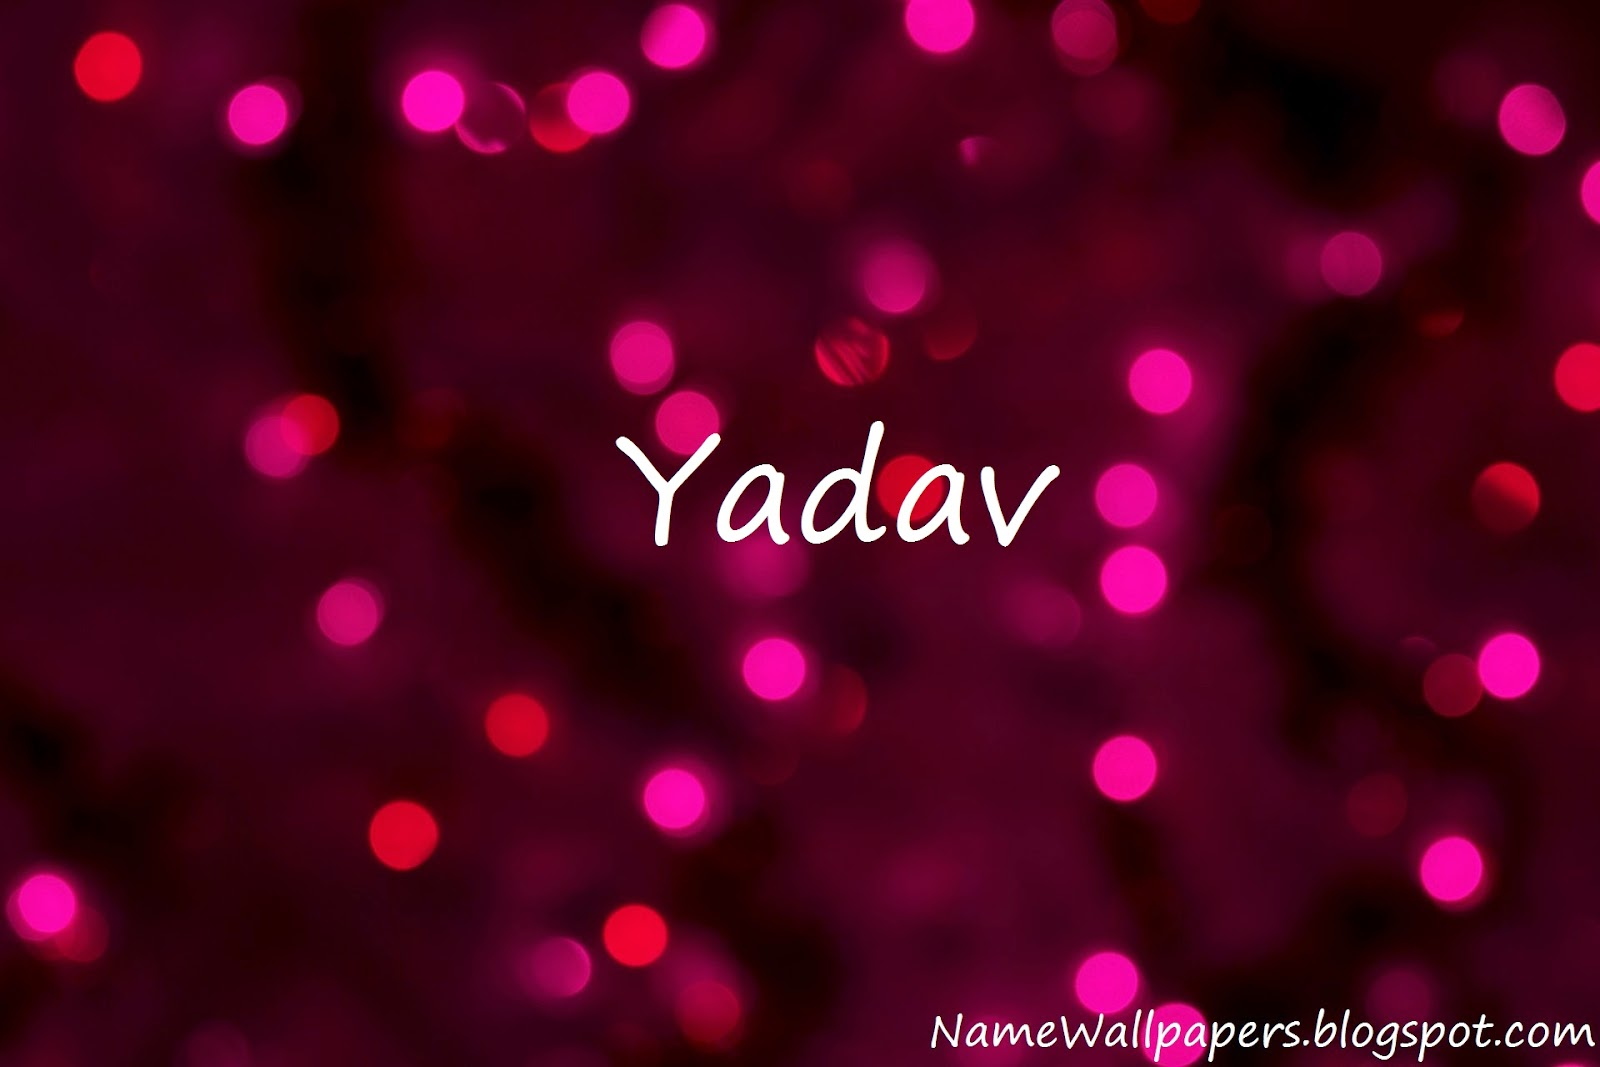 Yadav Name Wallpapers Yadav ~ Name Wallpaper Urdu Name Meaning Name Images Logo Signature